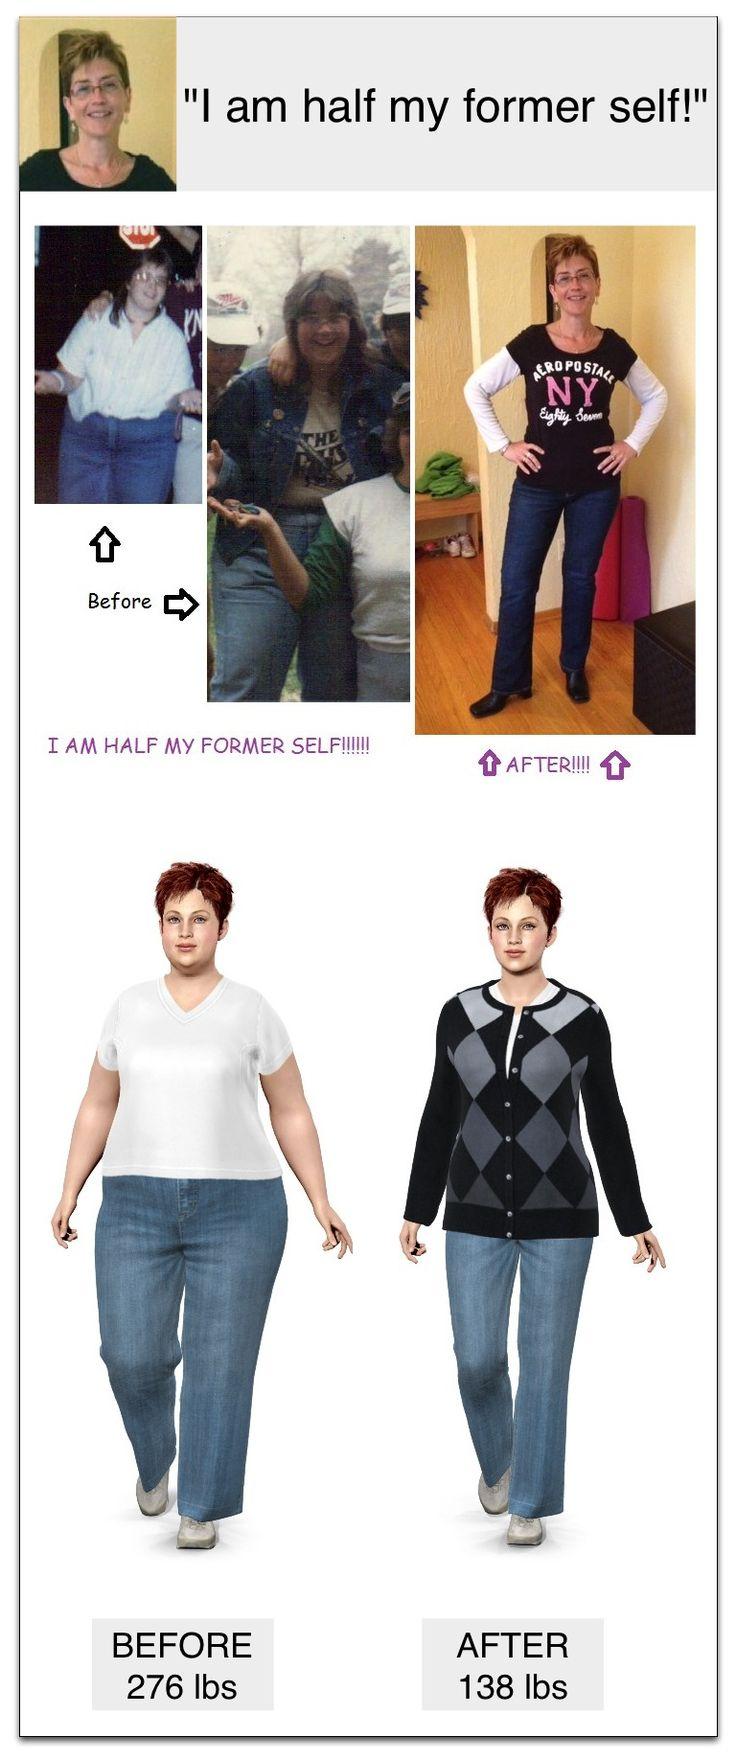 276 lbs > 138 lbs  = 138 lbs LOST!!! I lost half my former self!!!